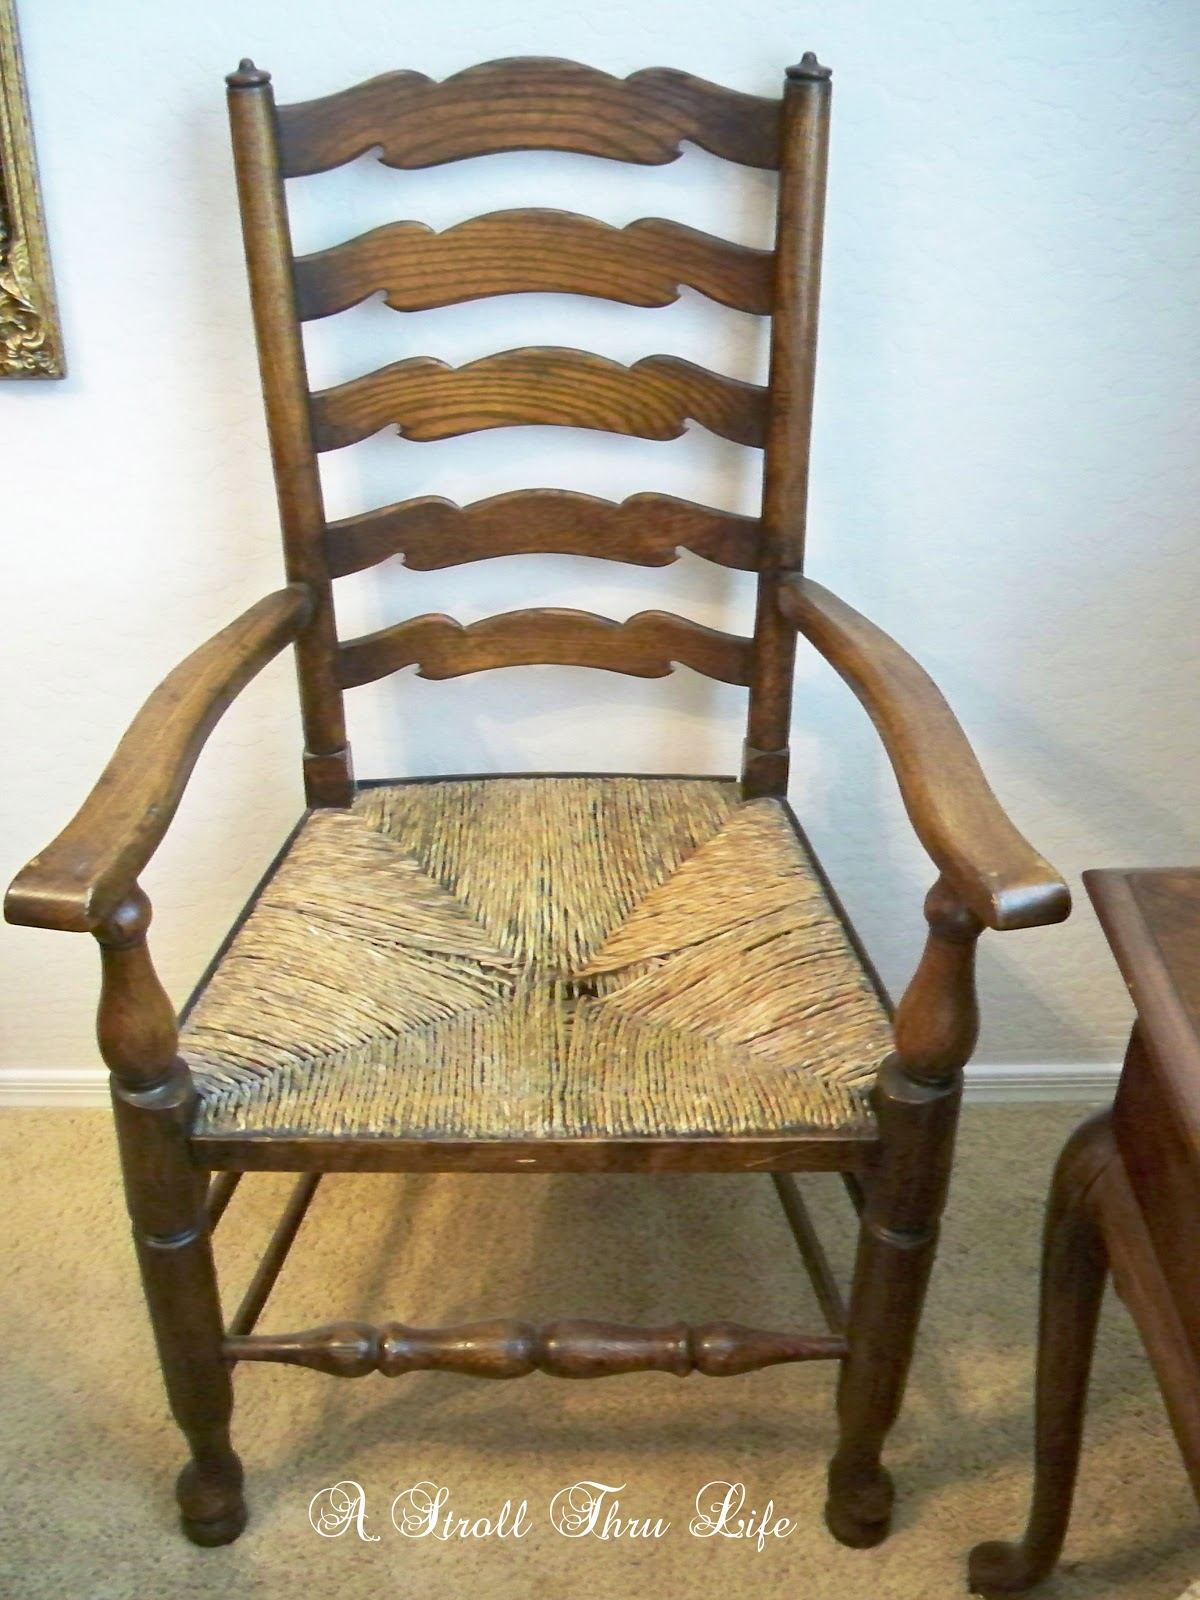 A Stroll Thru Life Replacing Rush Seats Upholstery Tutorial